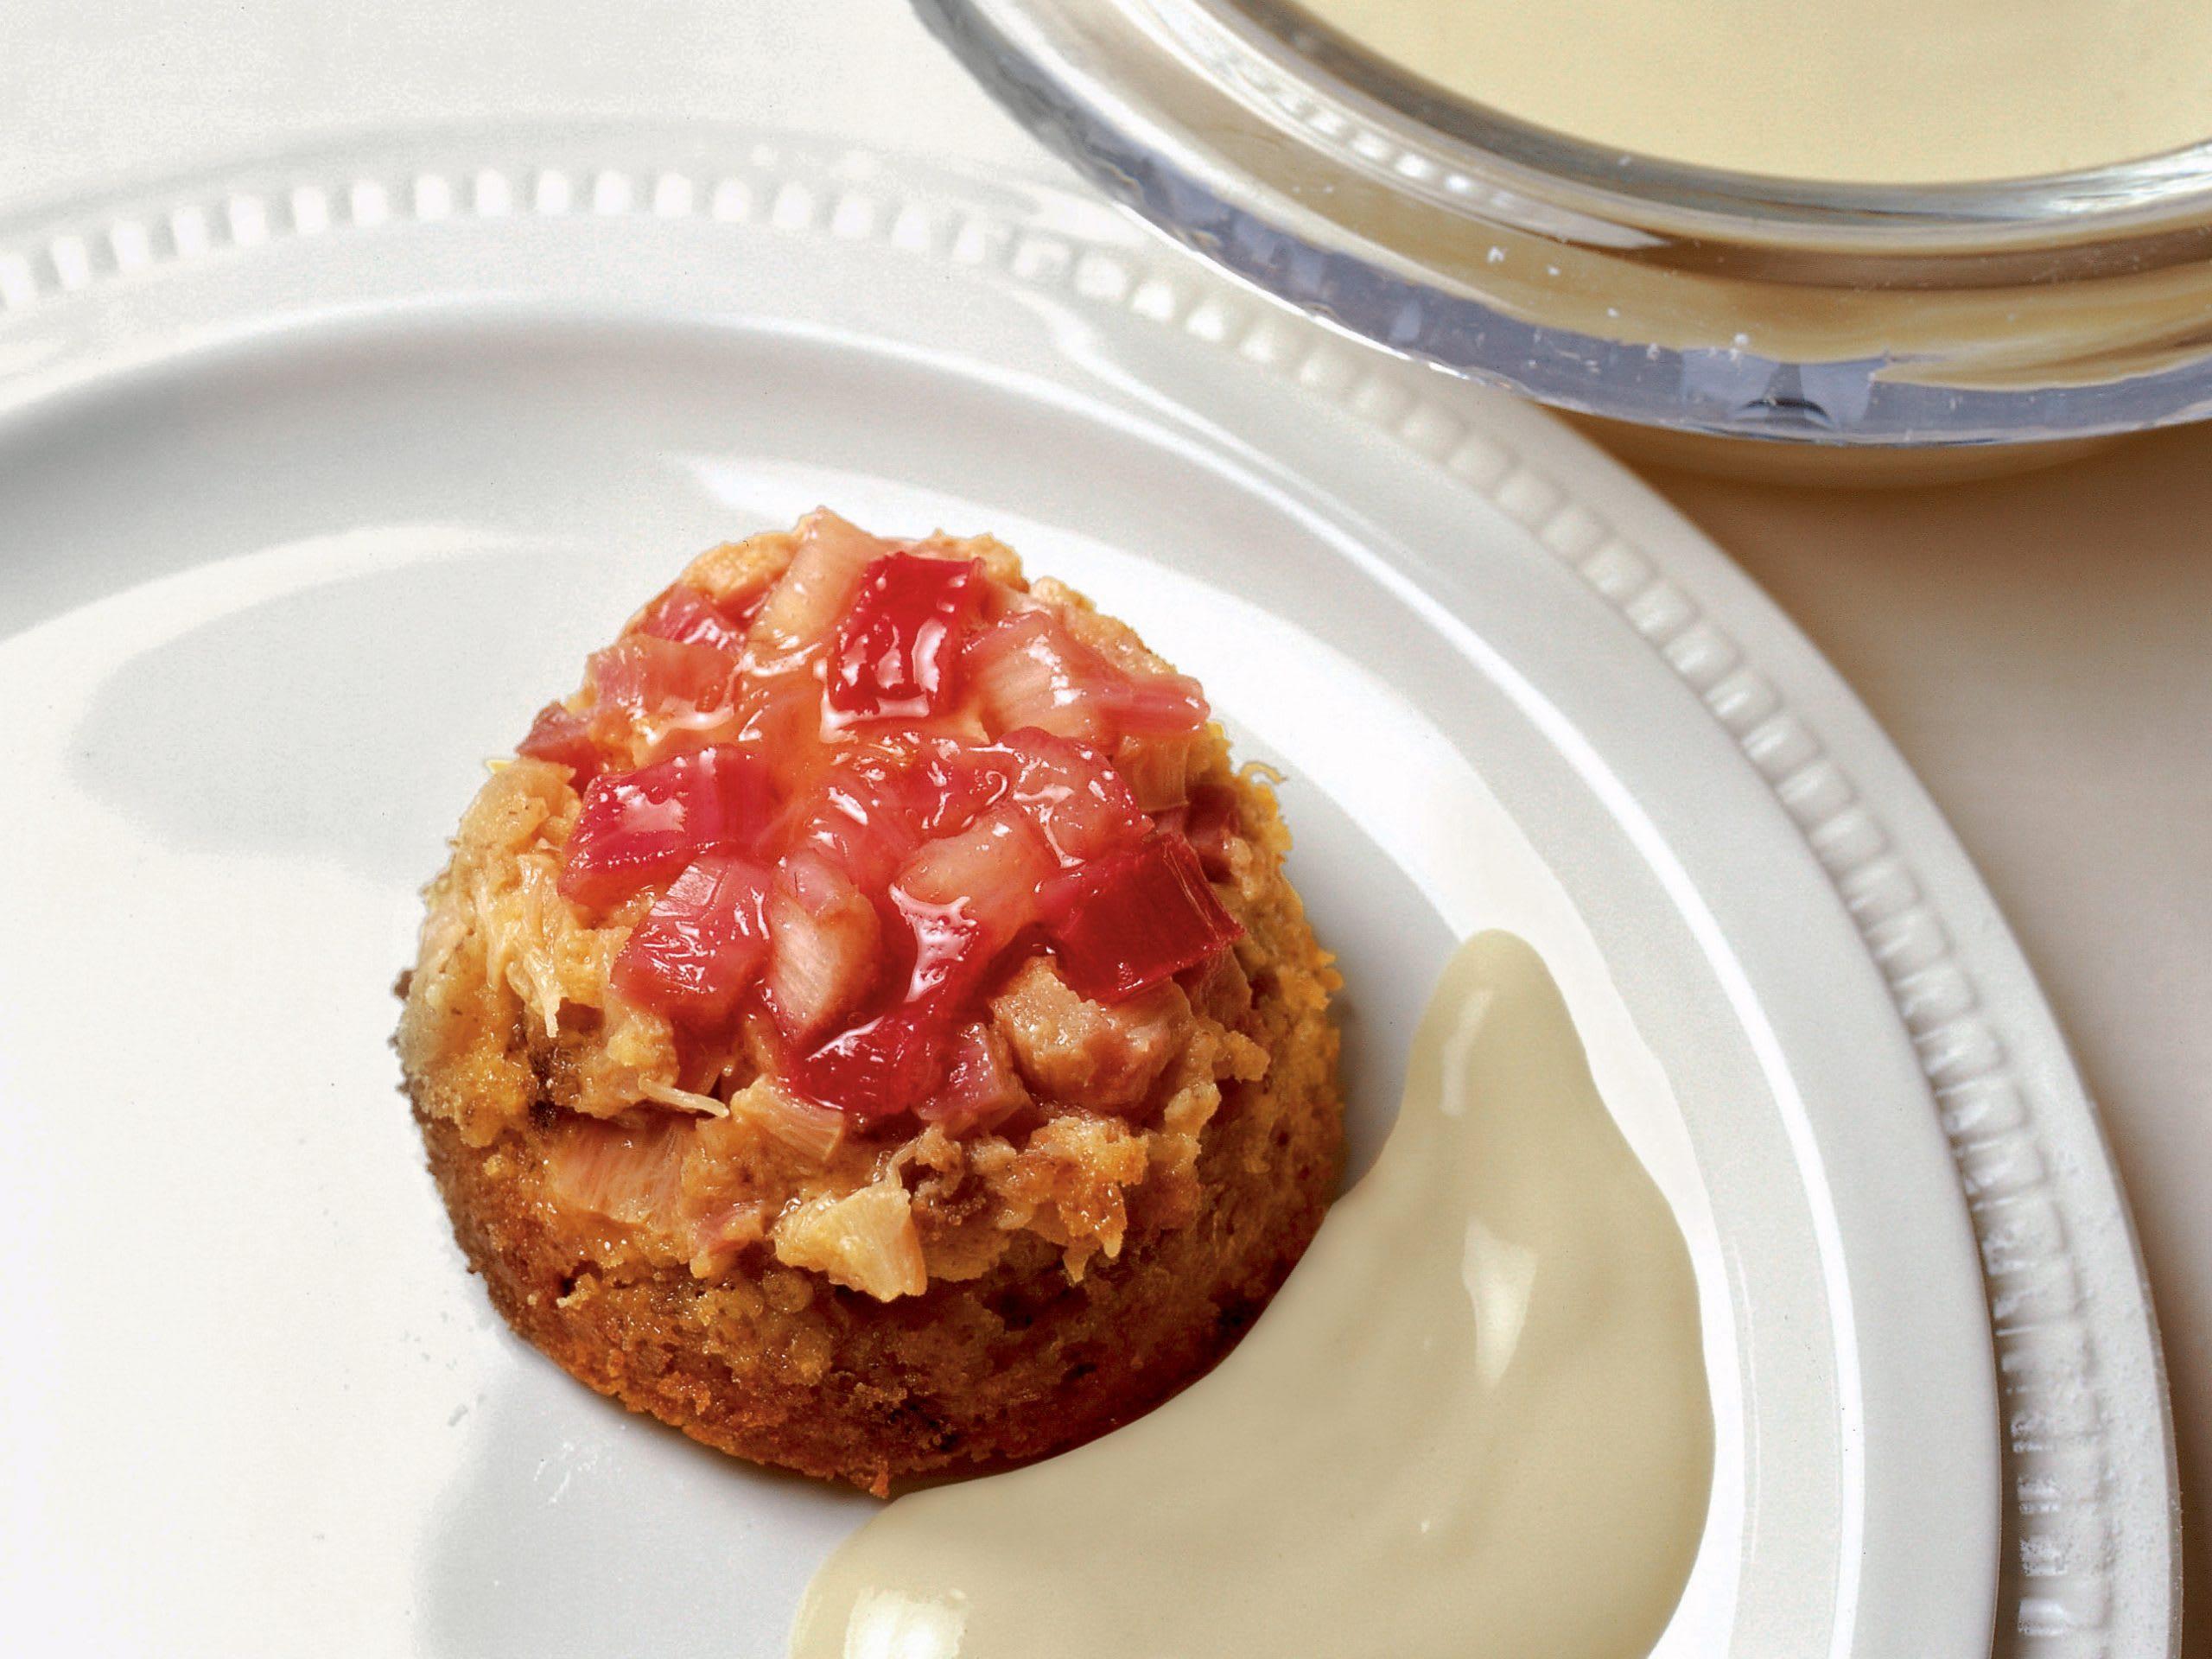 Brot-Rhabarber-Pudding mit Honig-Crème